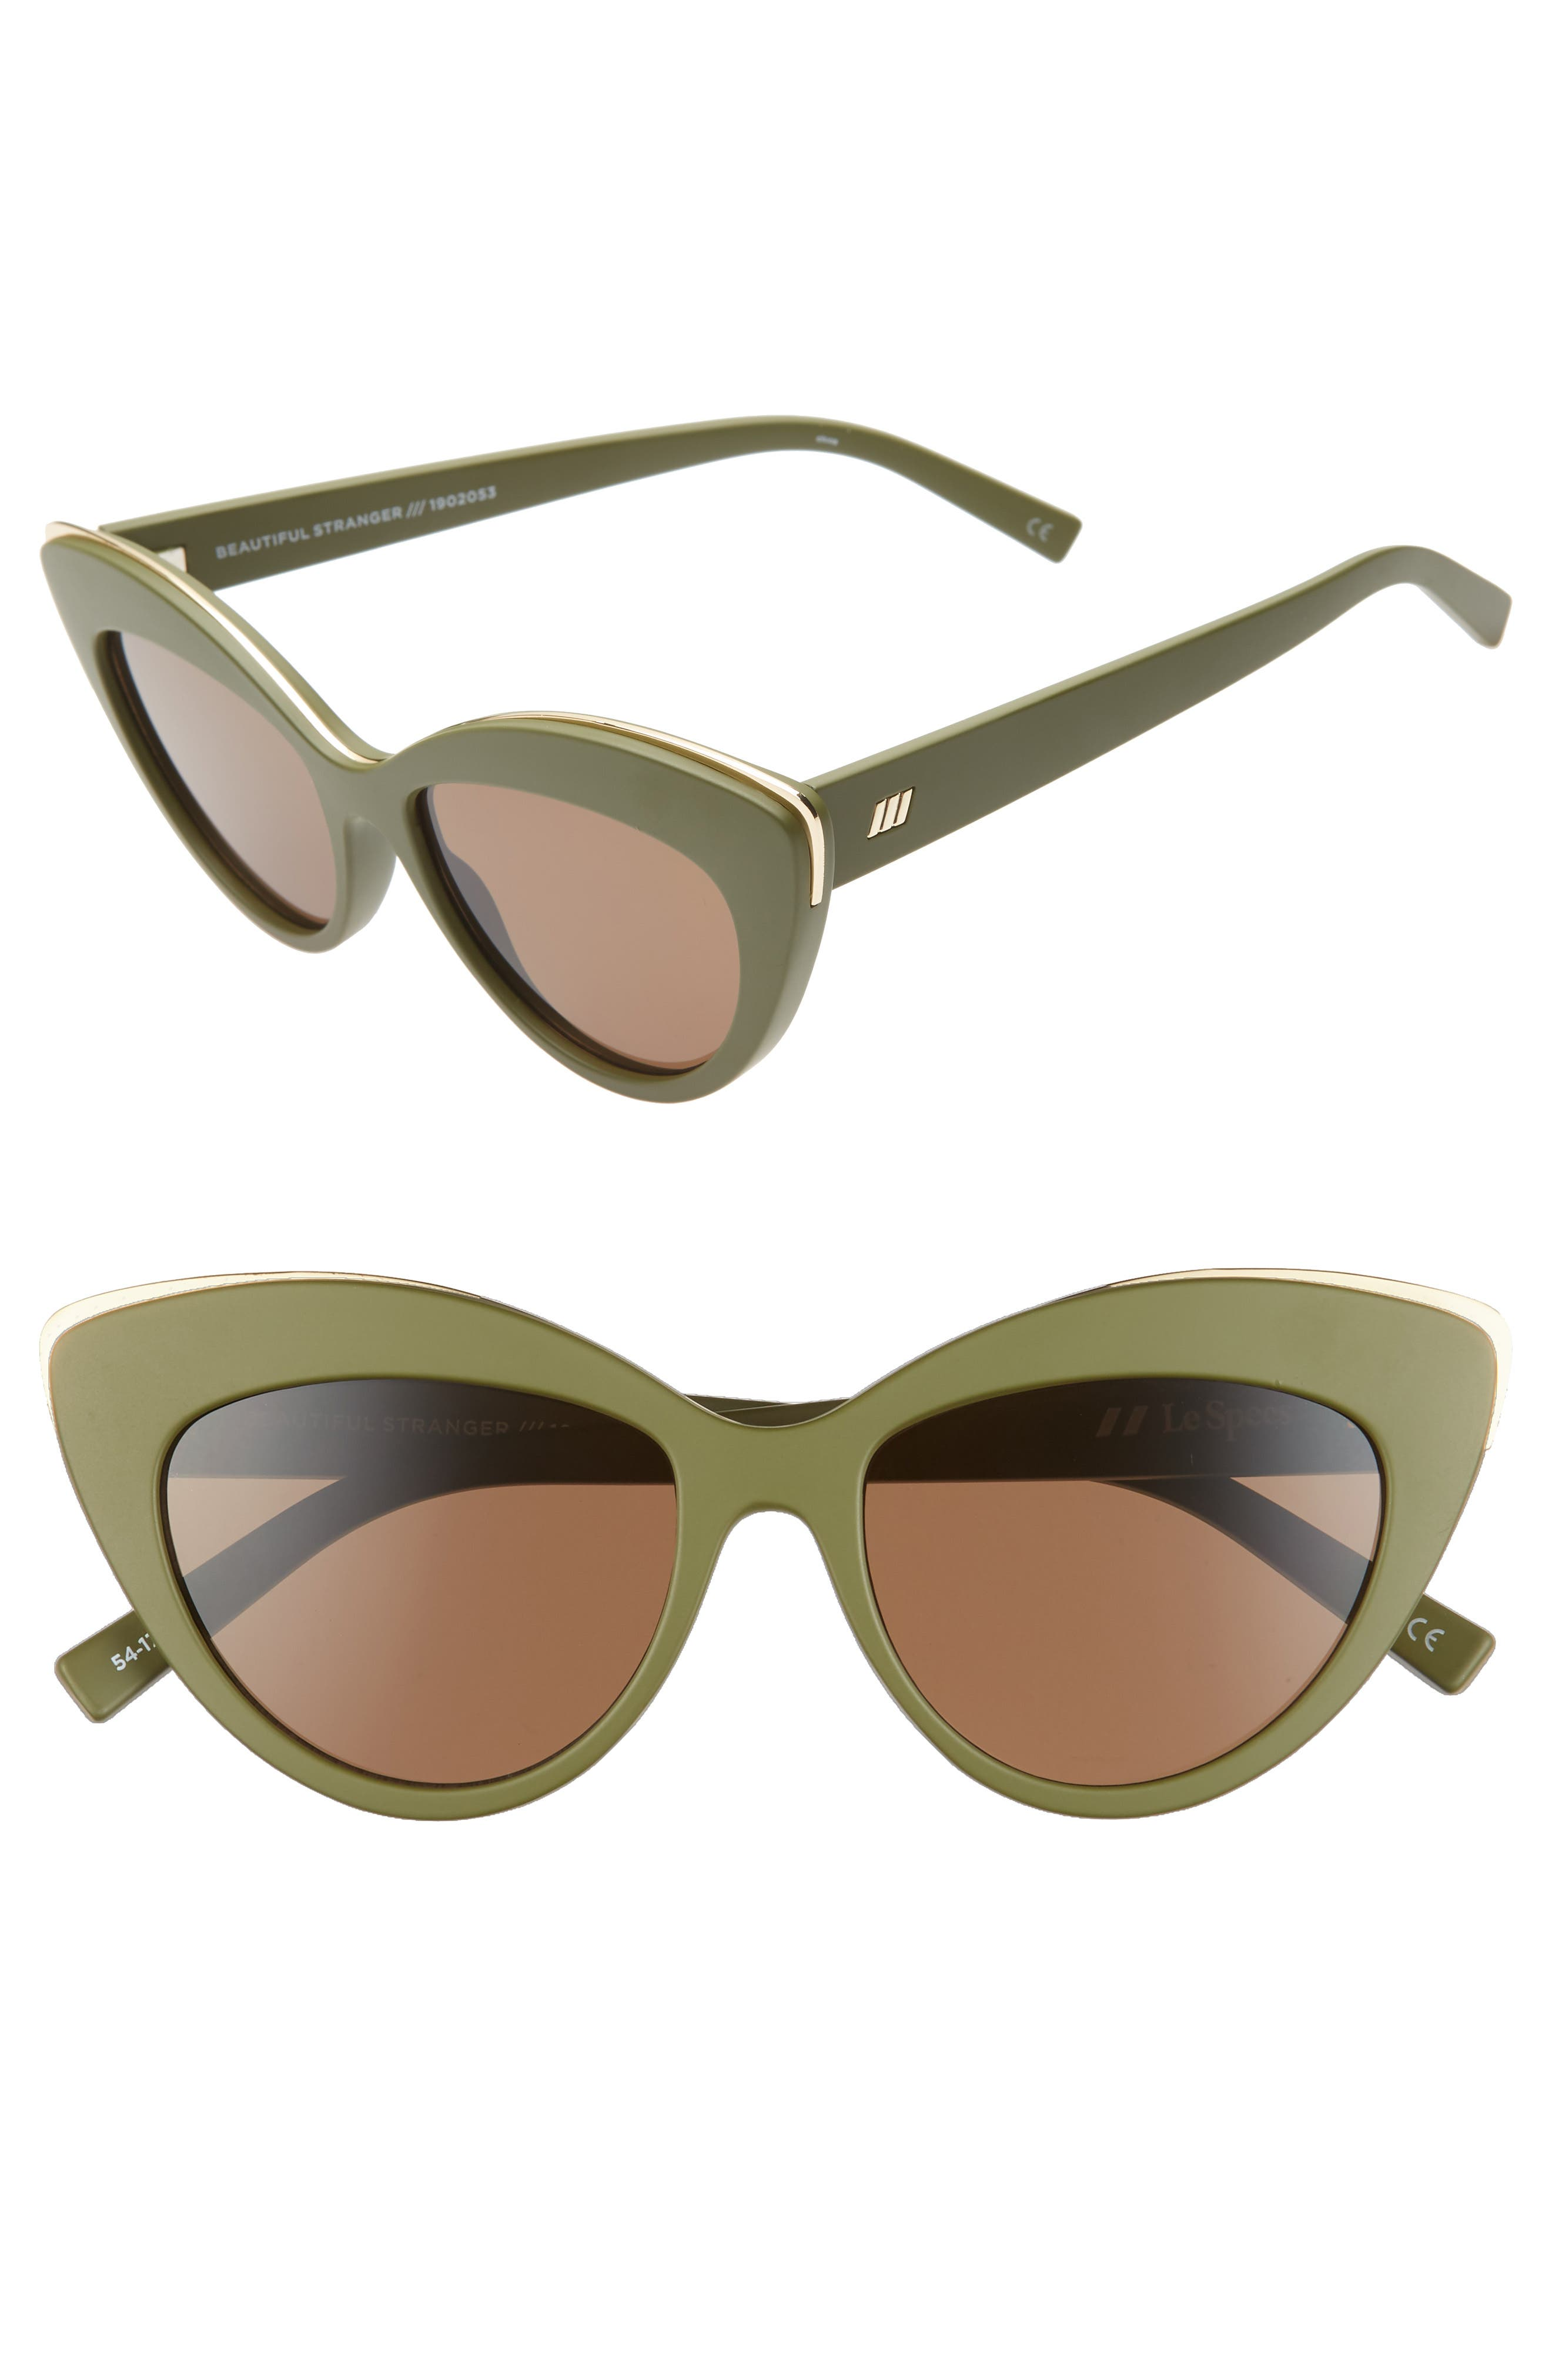 Le Specs Beautiful Stranger 5m Polarized Cat Eye Sunglasses - Matte Khaki